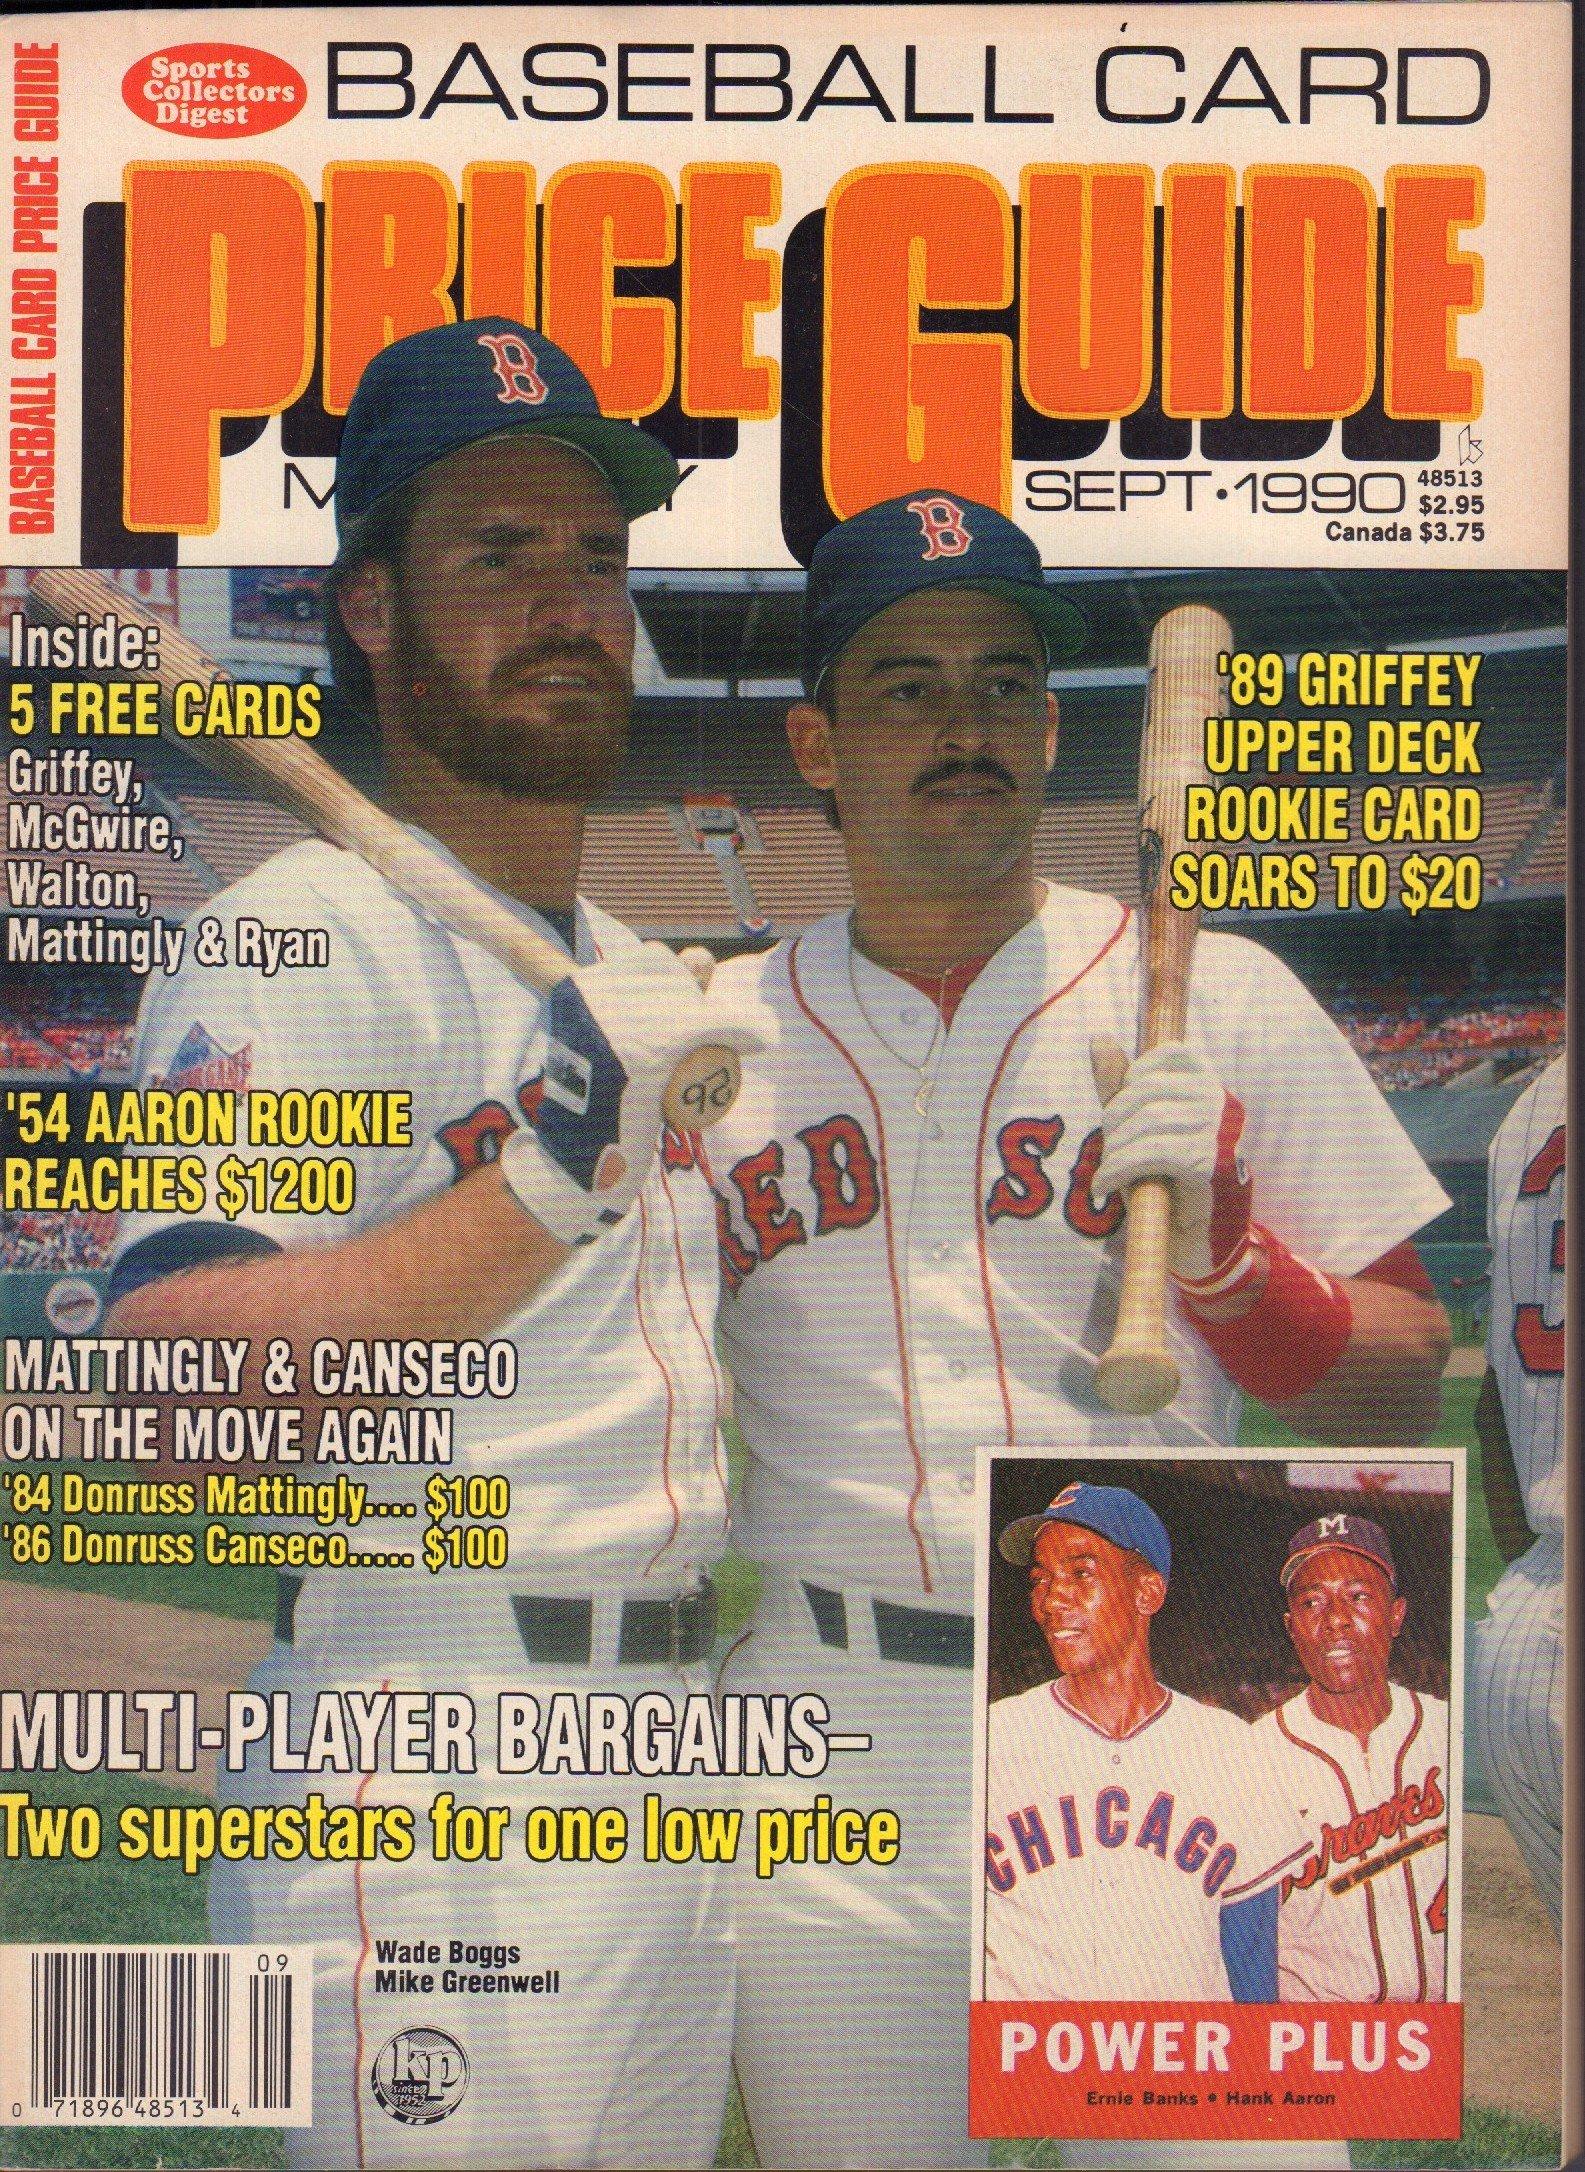 Baseball Card Price Guide September 1990 Ken Griffey